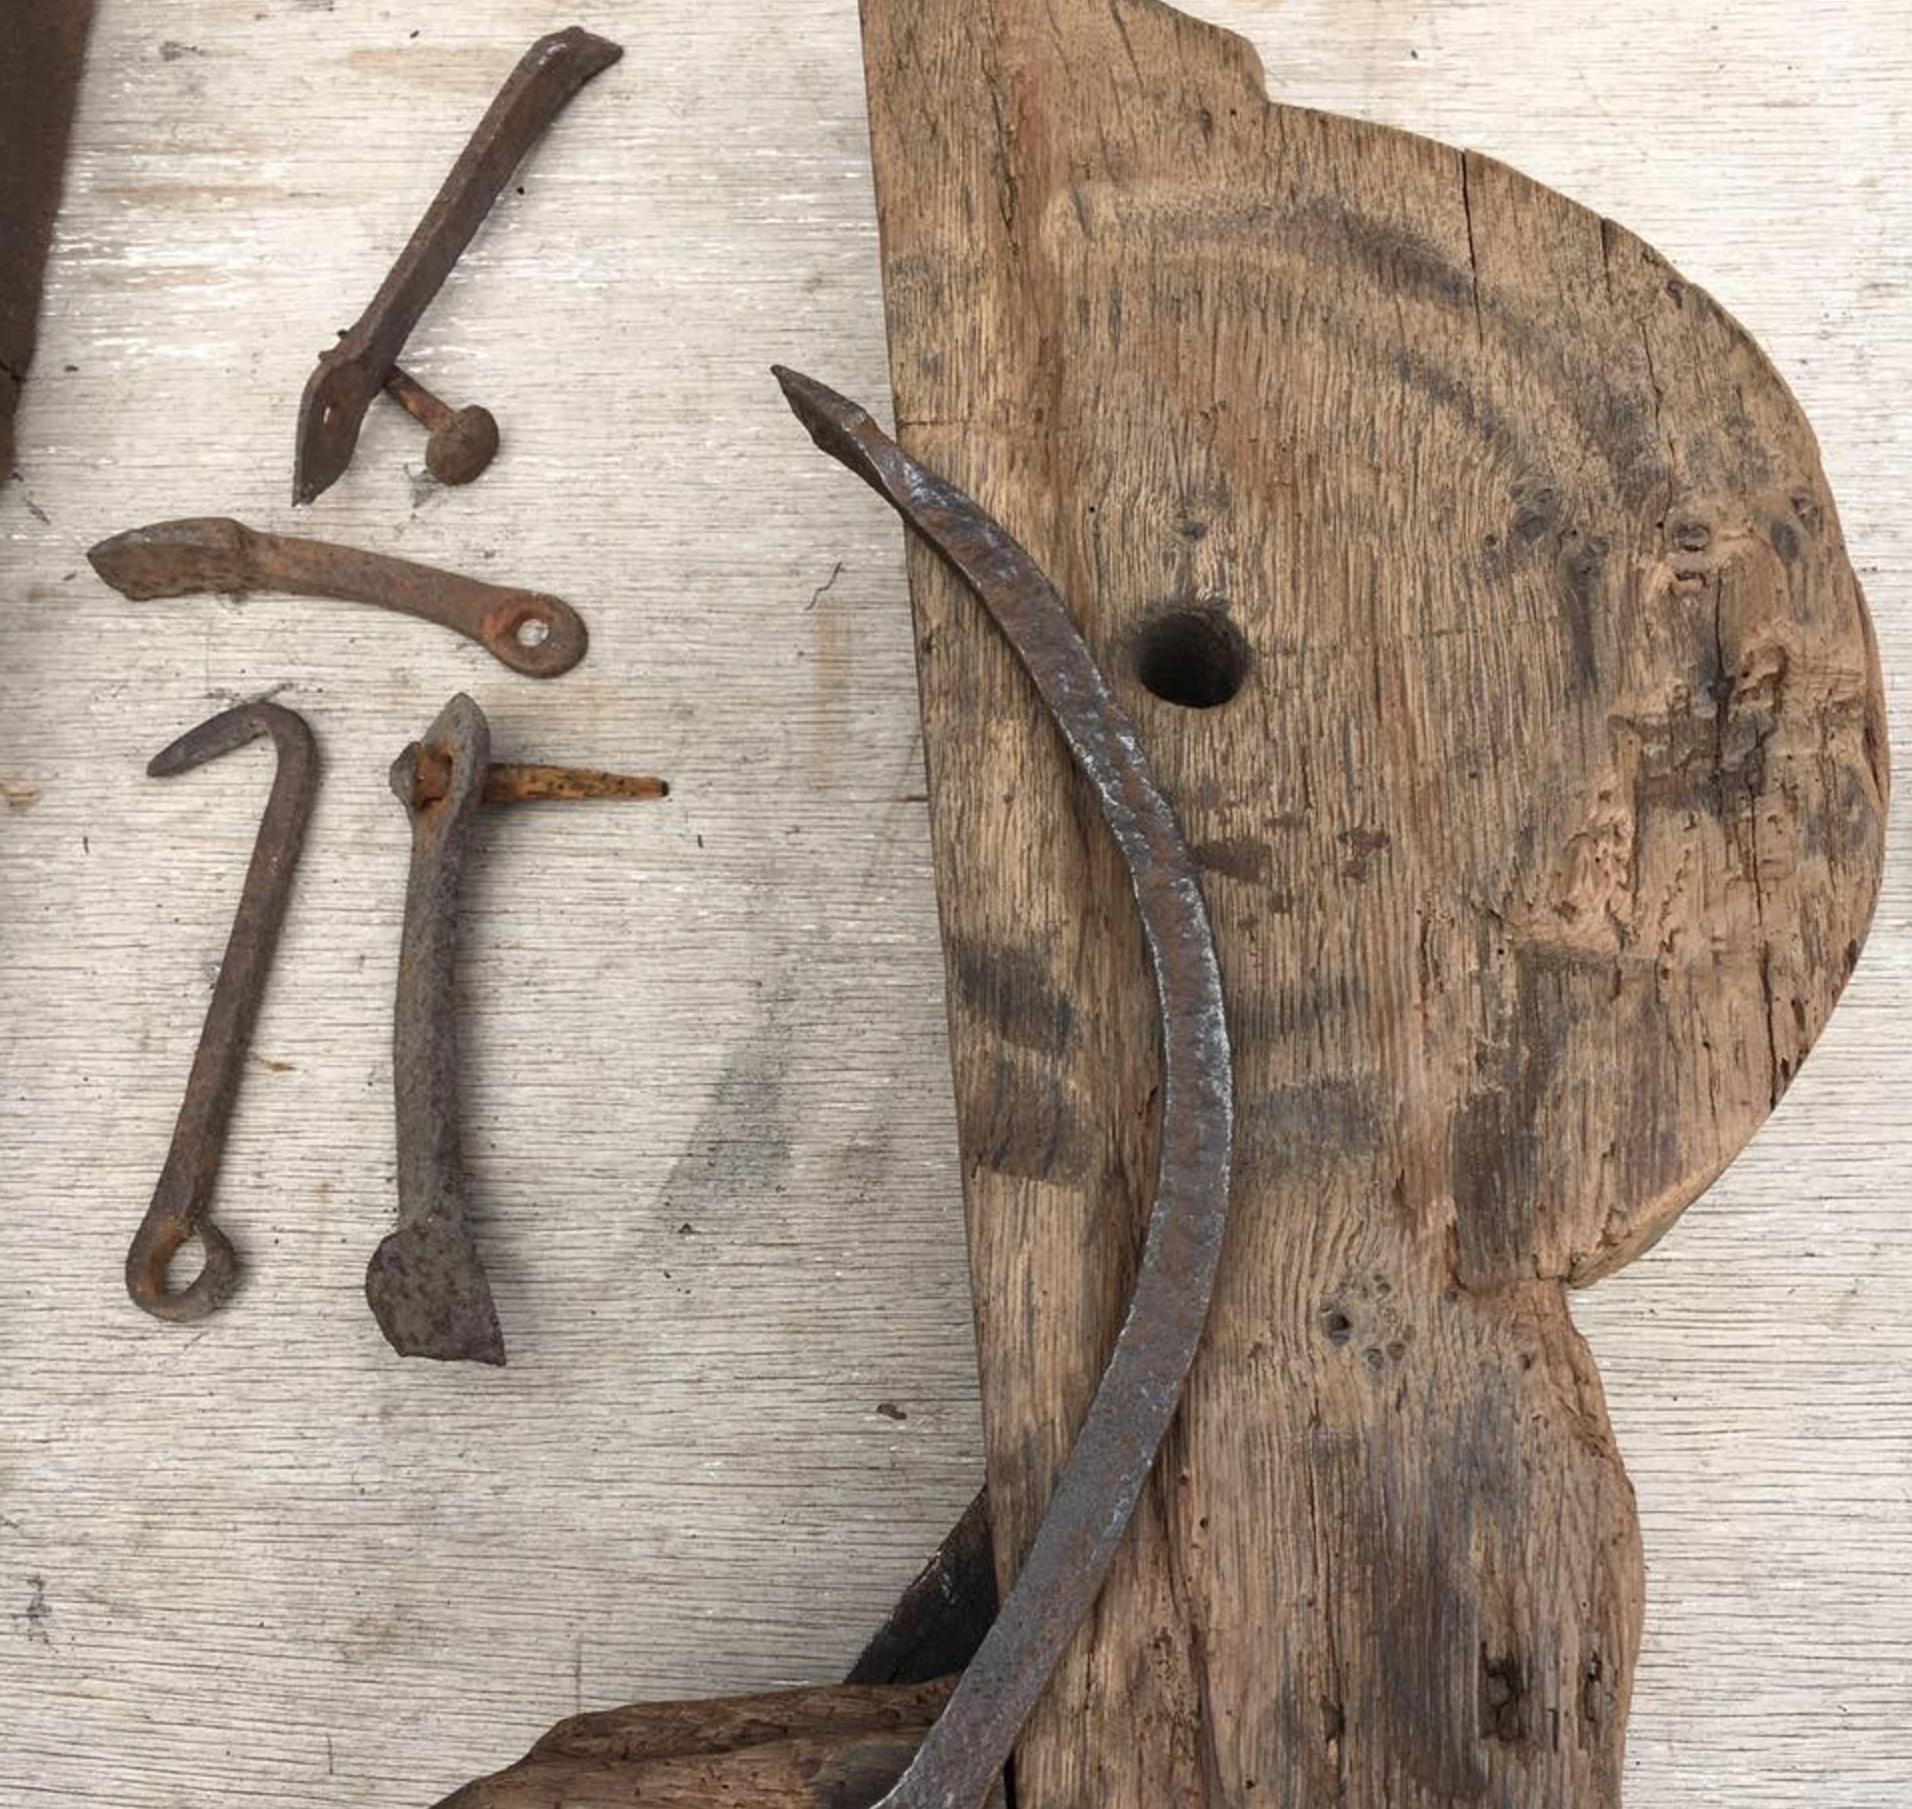 HB tools